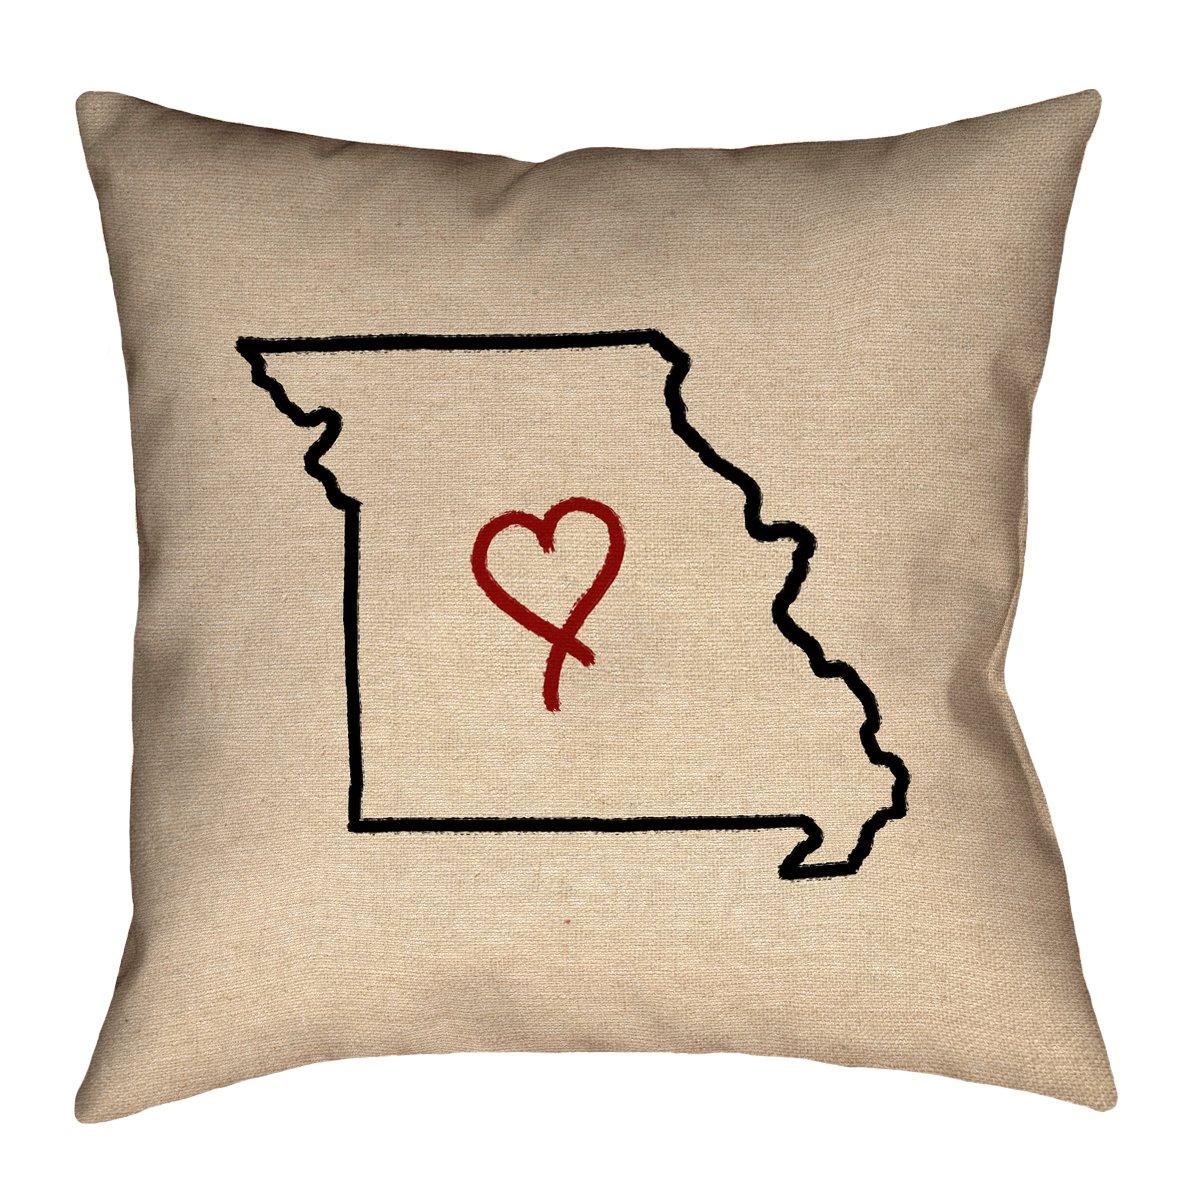 ArtVerse Katelyn Smith 16\' x 16\' Outdoor Pillows & Cushions UV Properties + Waterproof and Mildew Proof Missouri Love Pillow